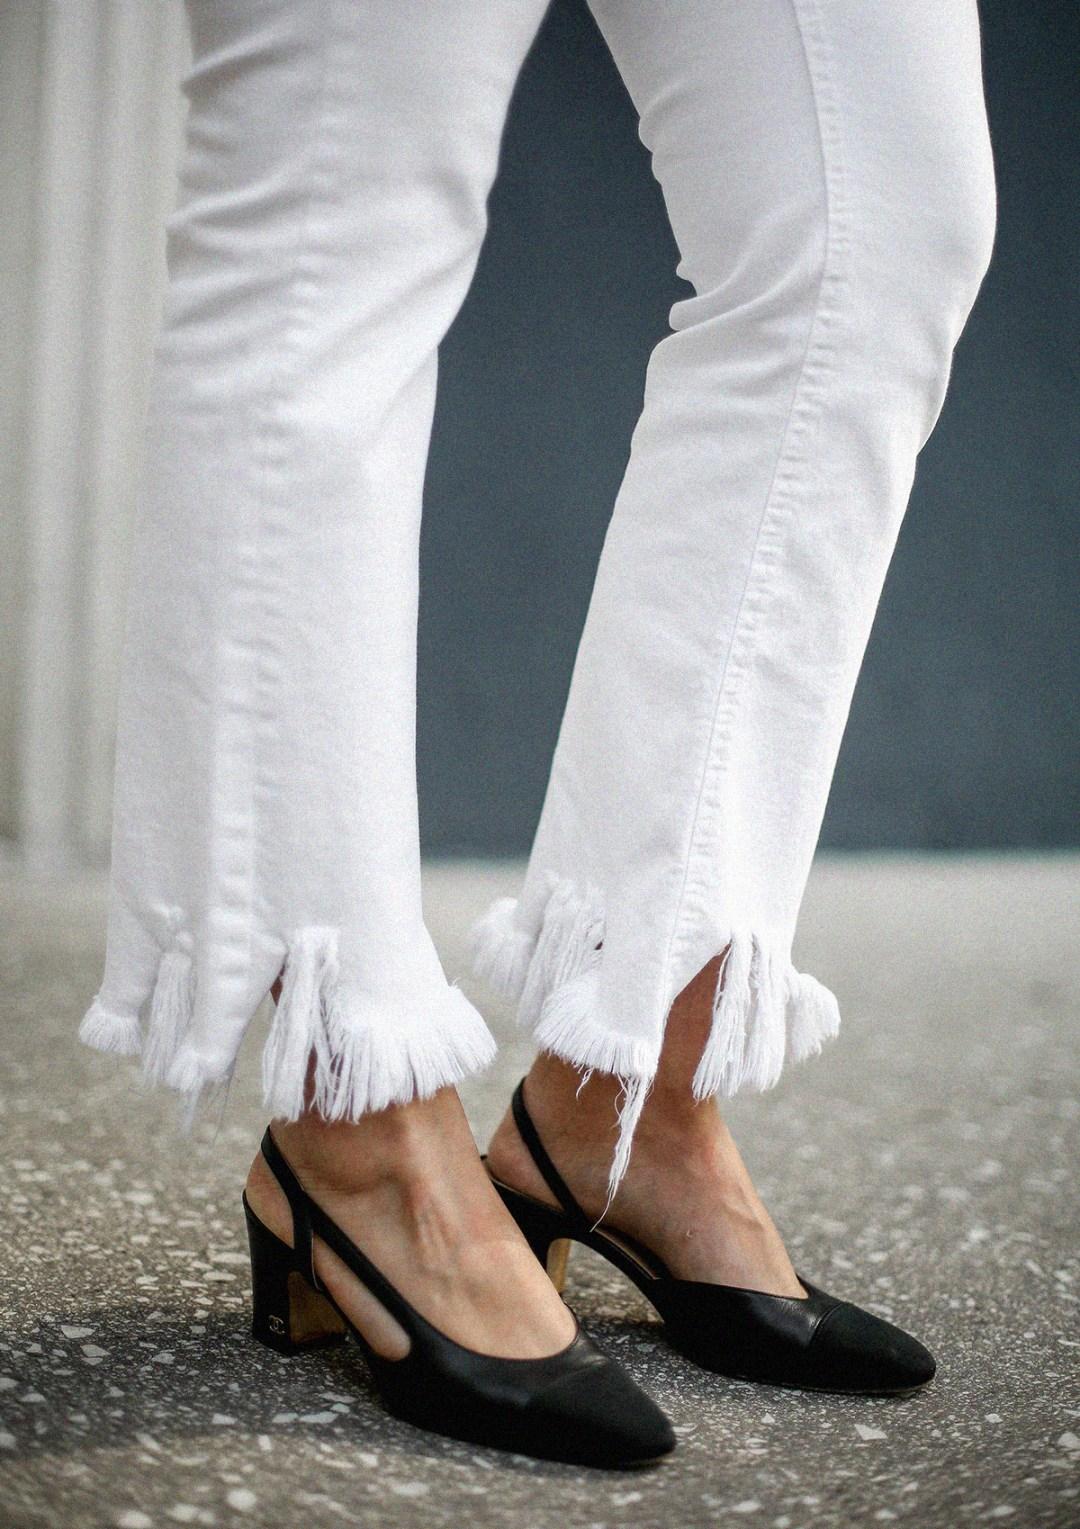 flower-top-zara-frayed-white-jeans-chanel-slingback-jw-anderson-bag-streetstyle6